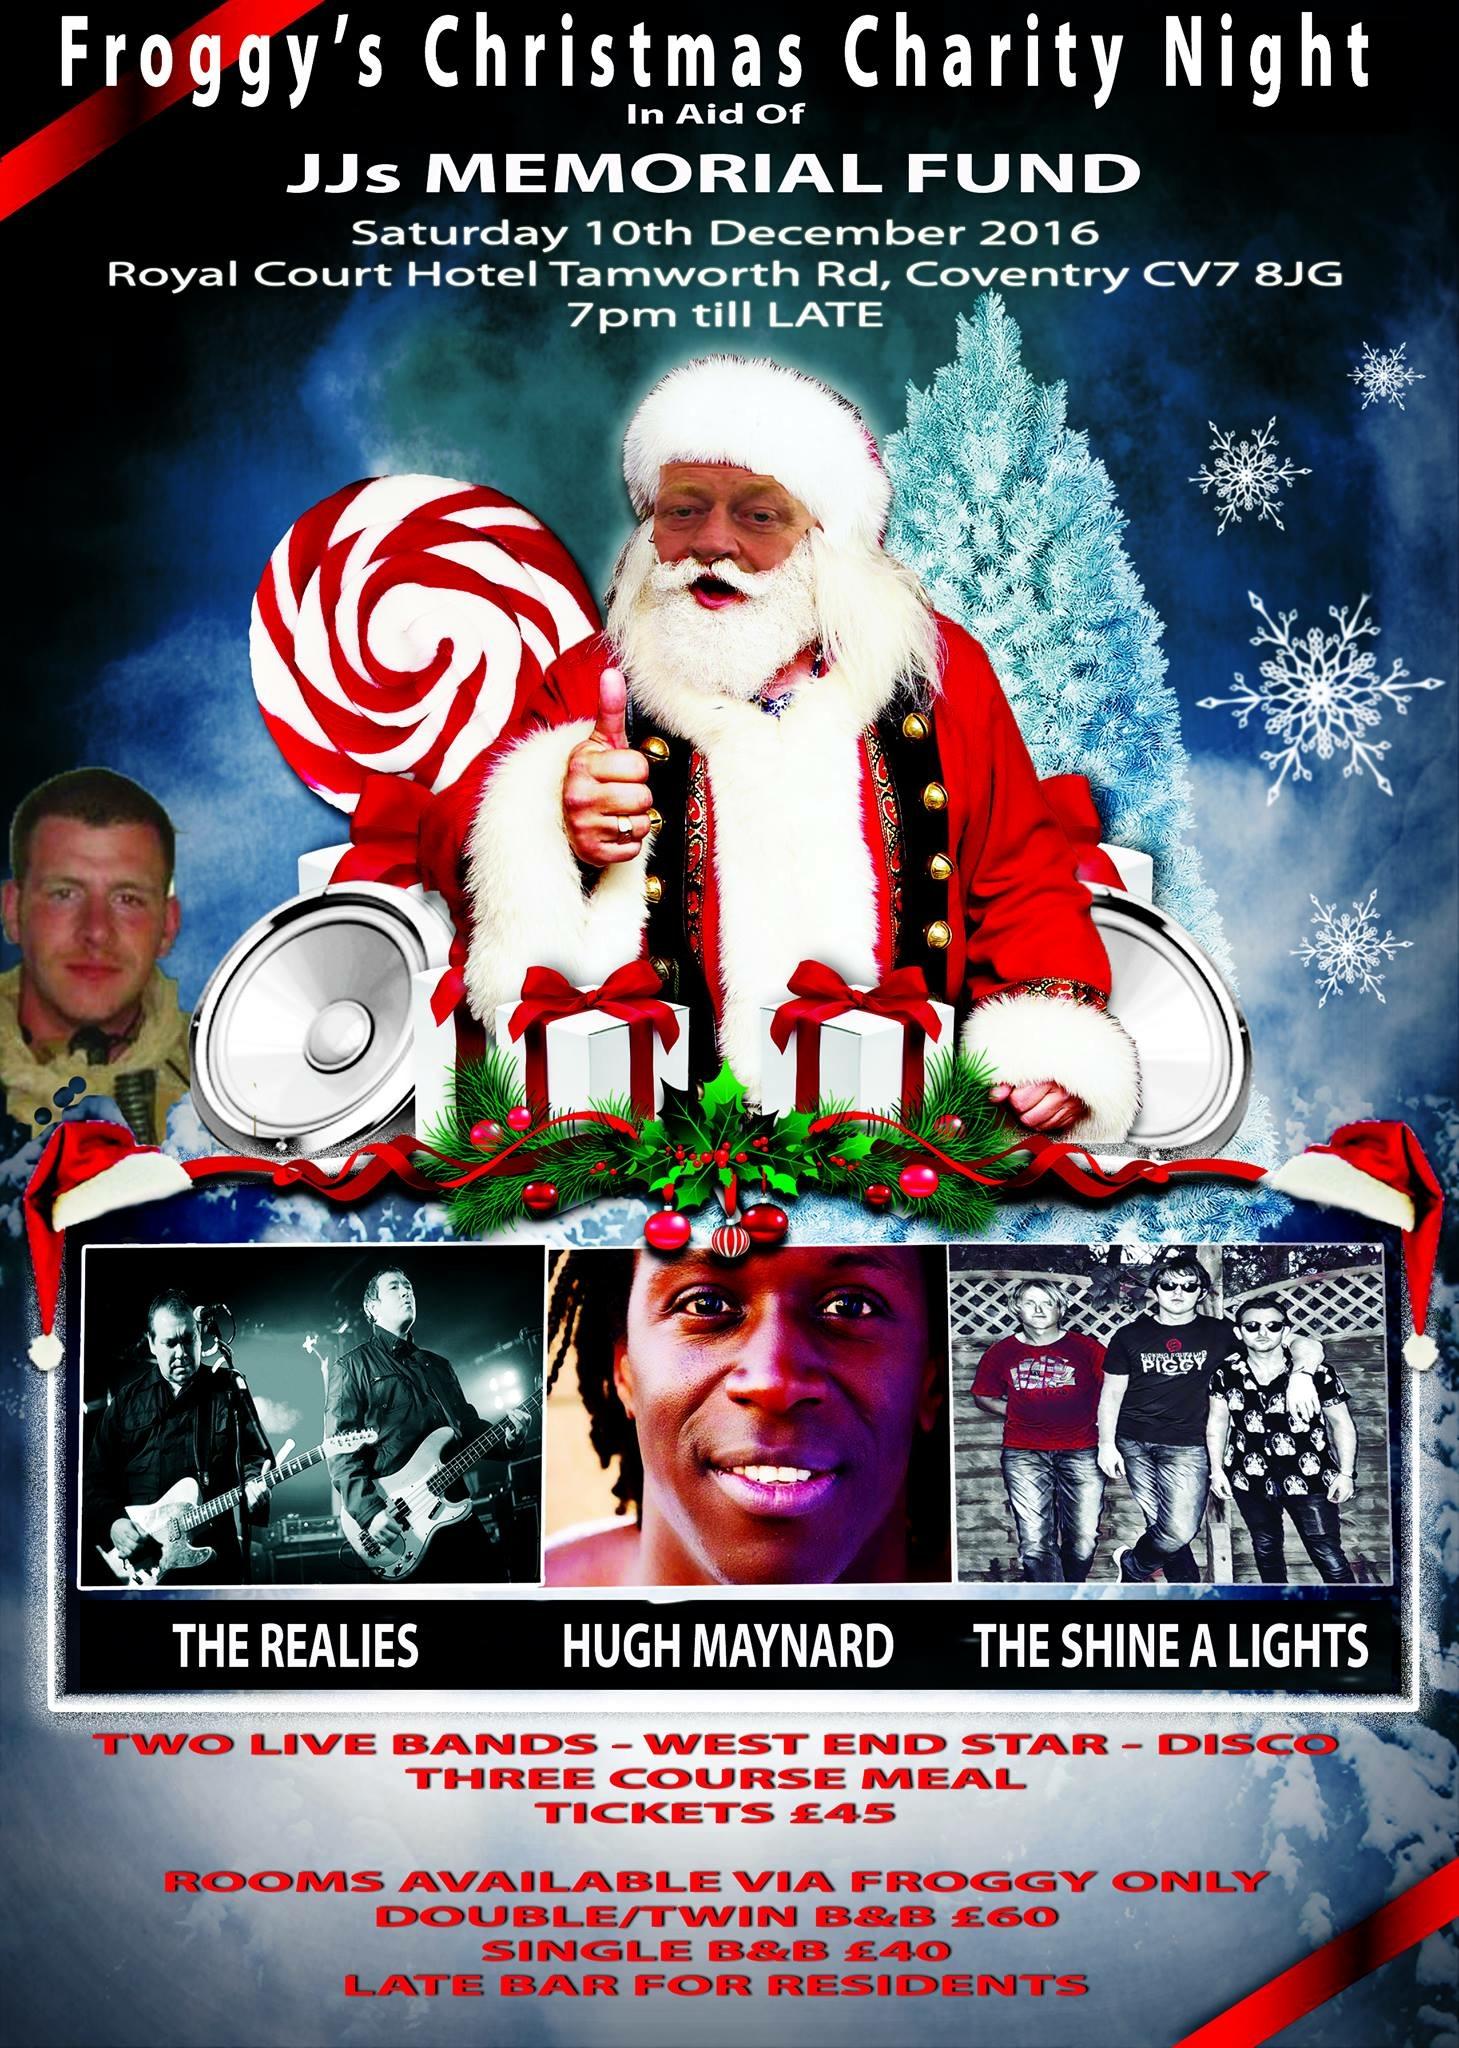 jjs memorial fund christmas charity night